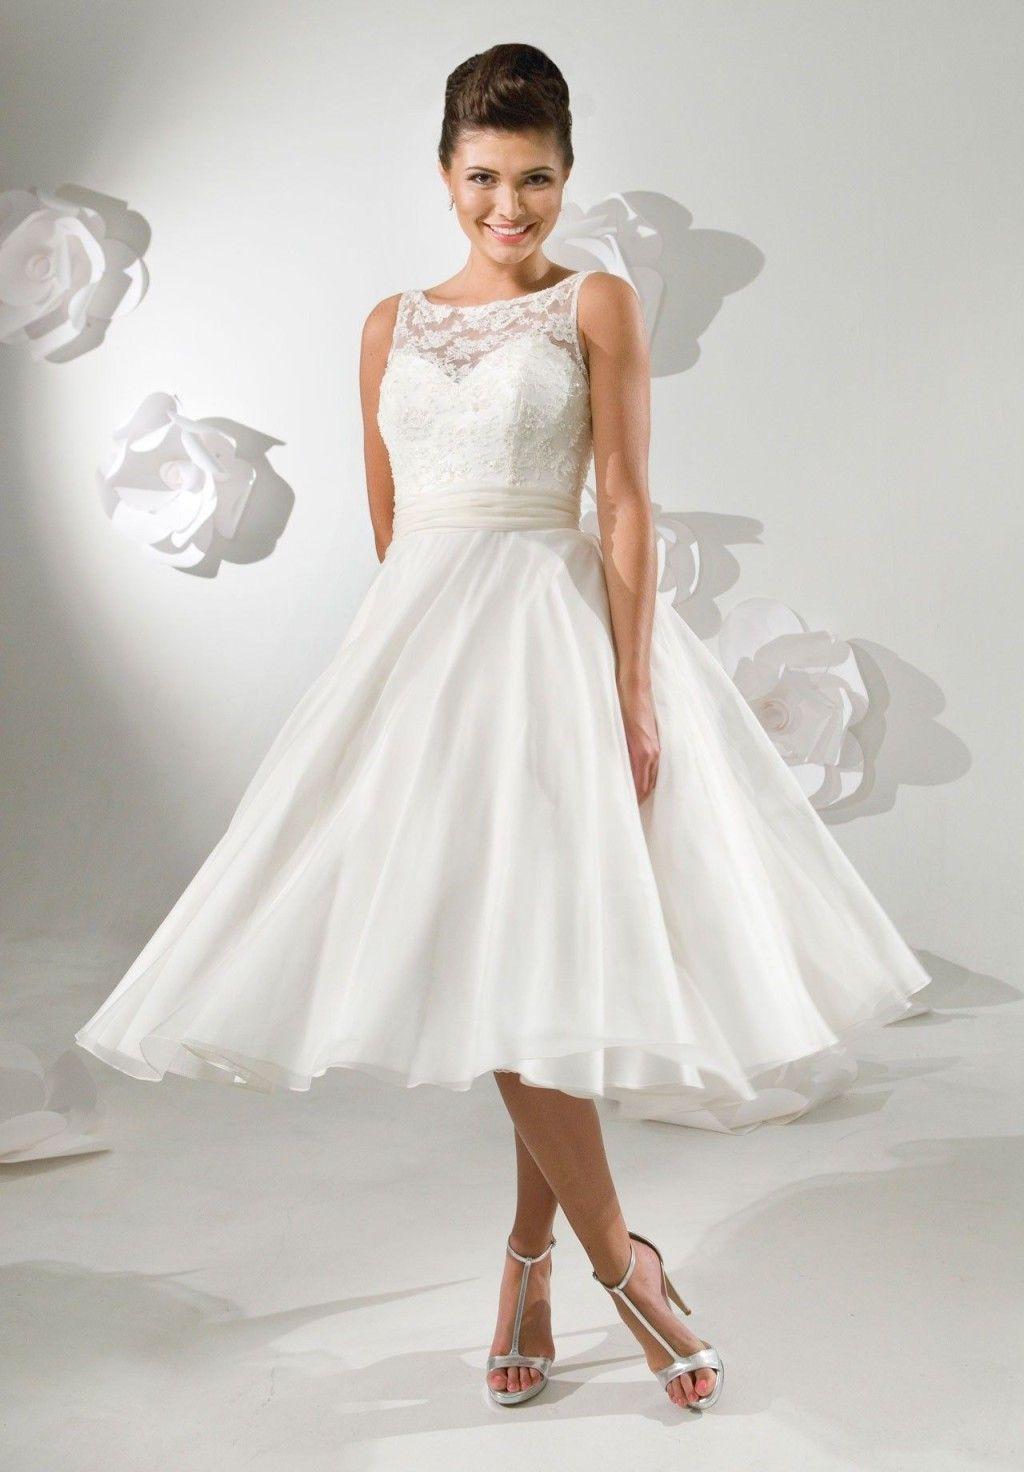 18 vintage tea length wedding dresses awesome classic vintage wedding dress ombrellifo Images